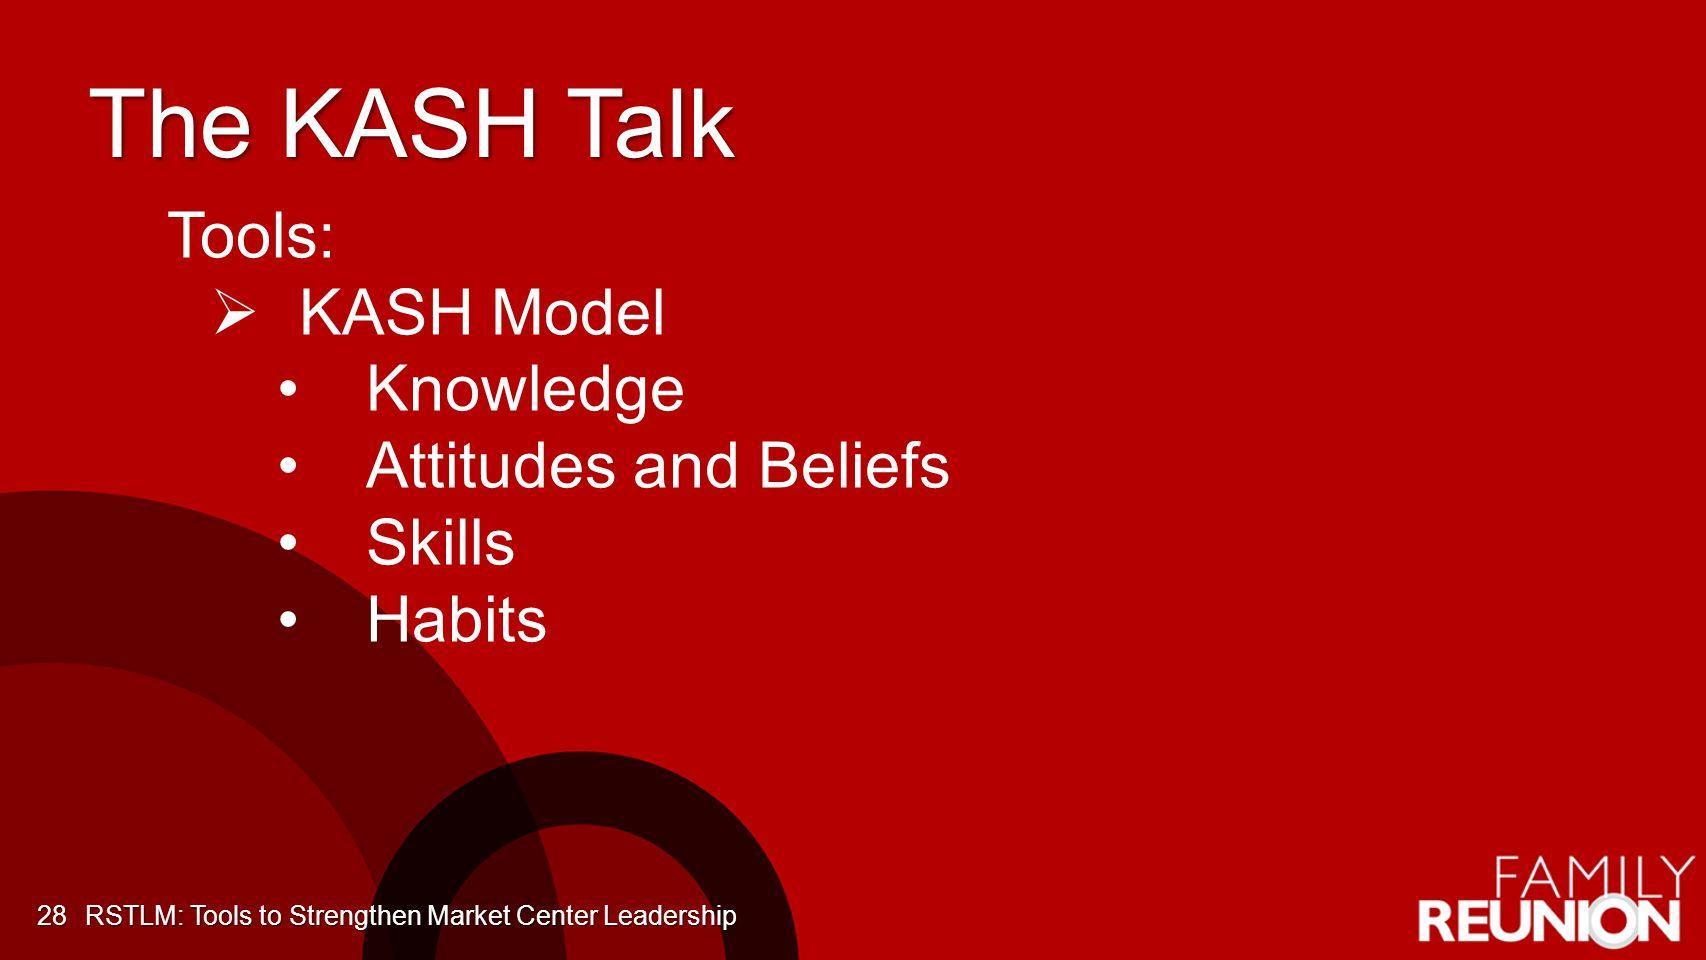 The KASH Talk Tools: KASH Model Knowledge Attitudes and Beliefs Skills